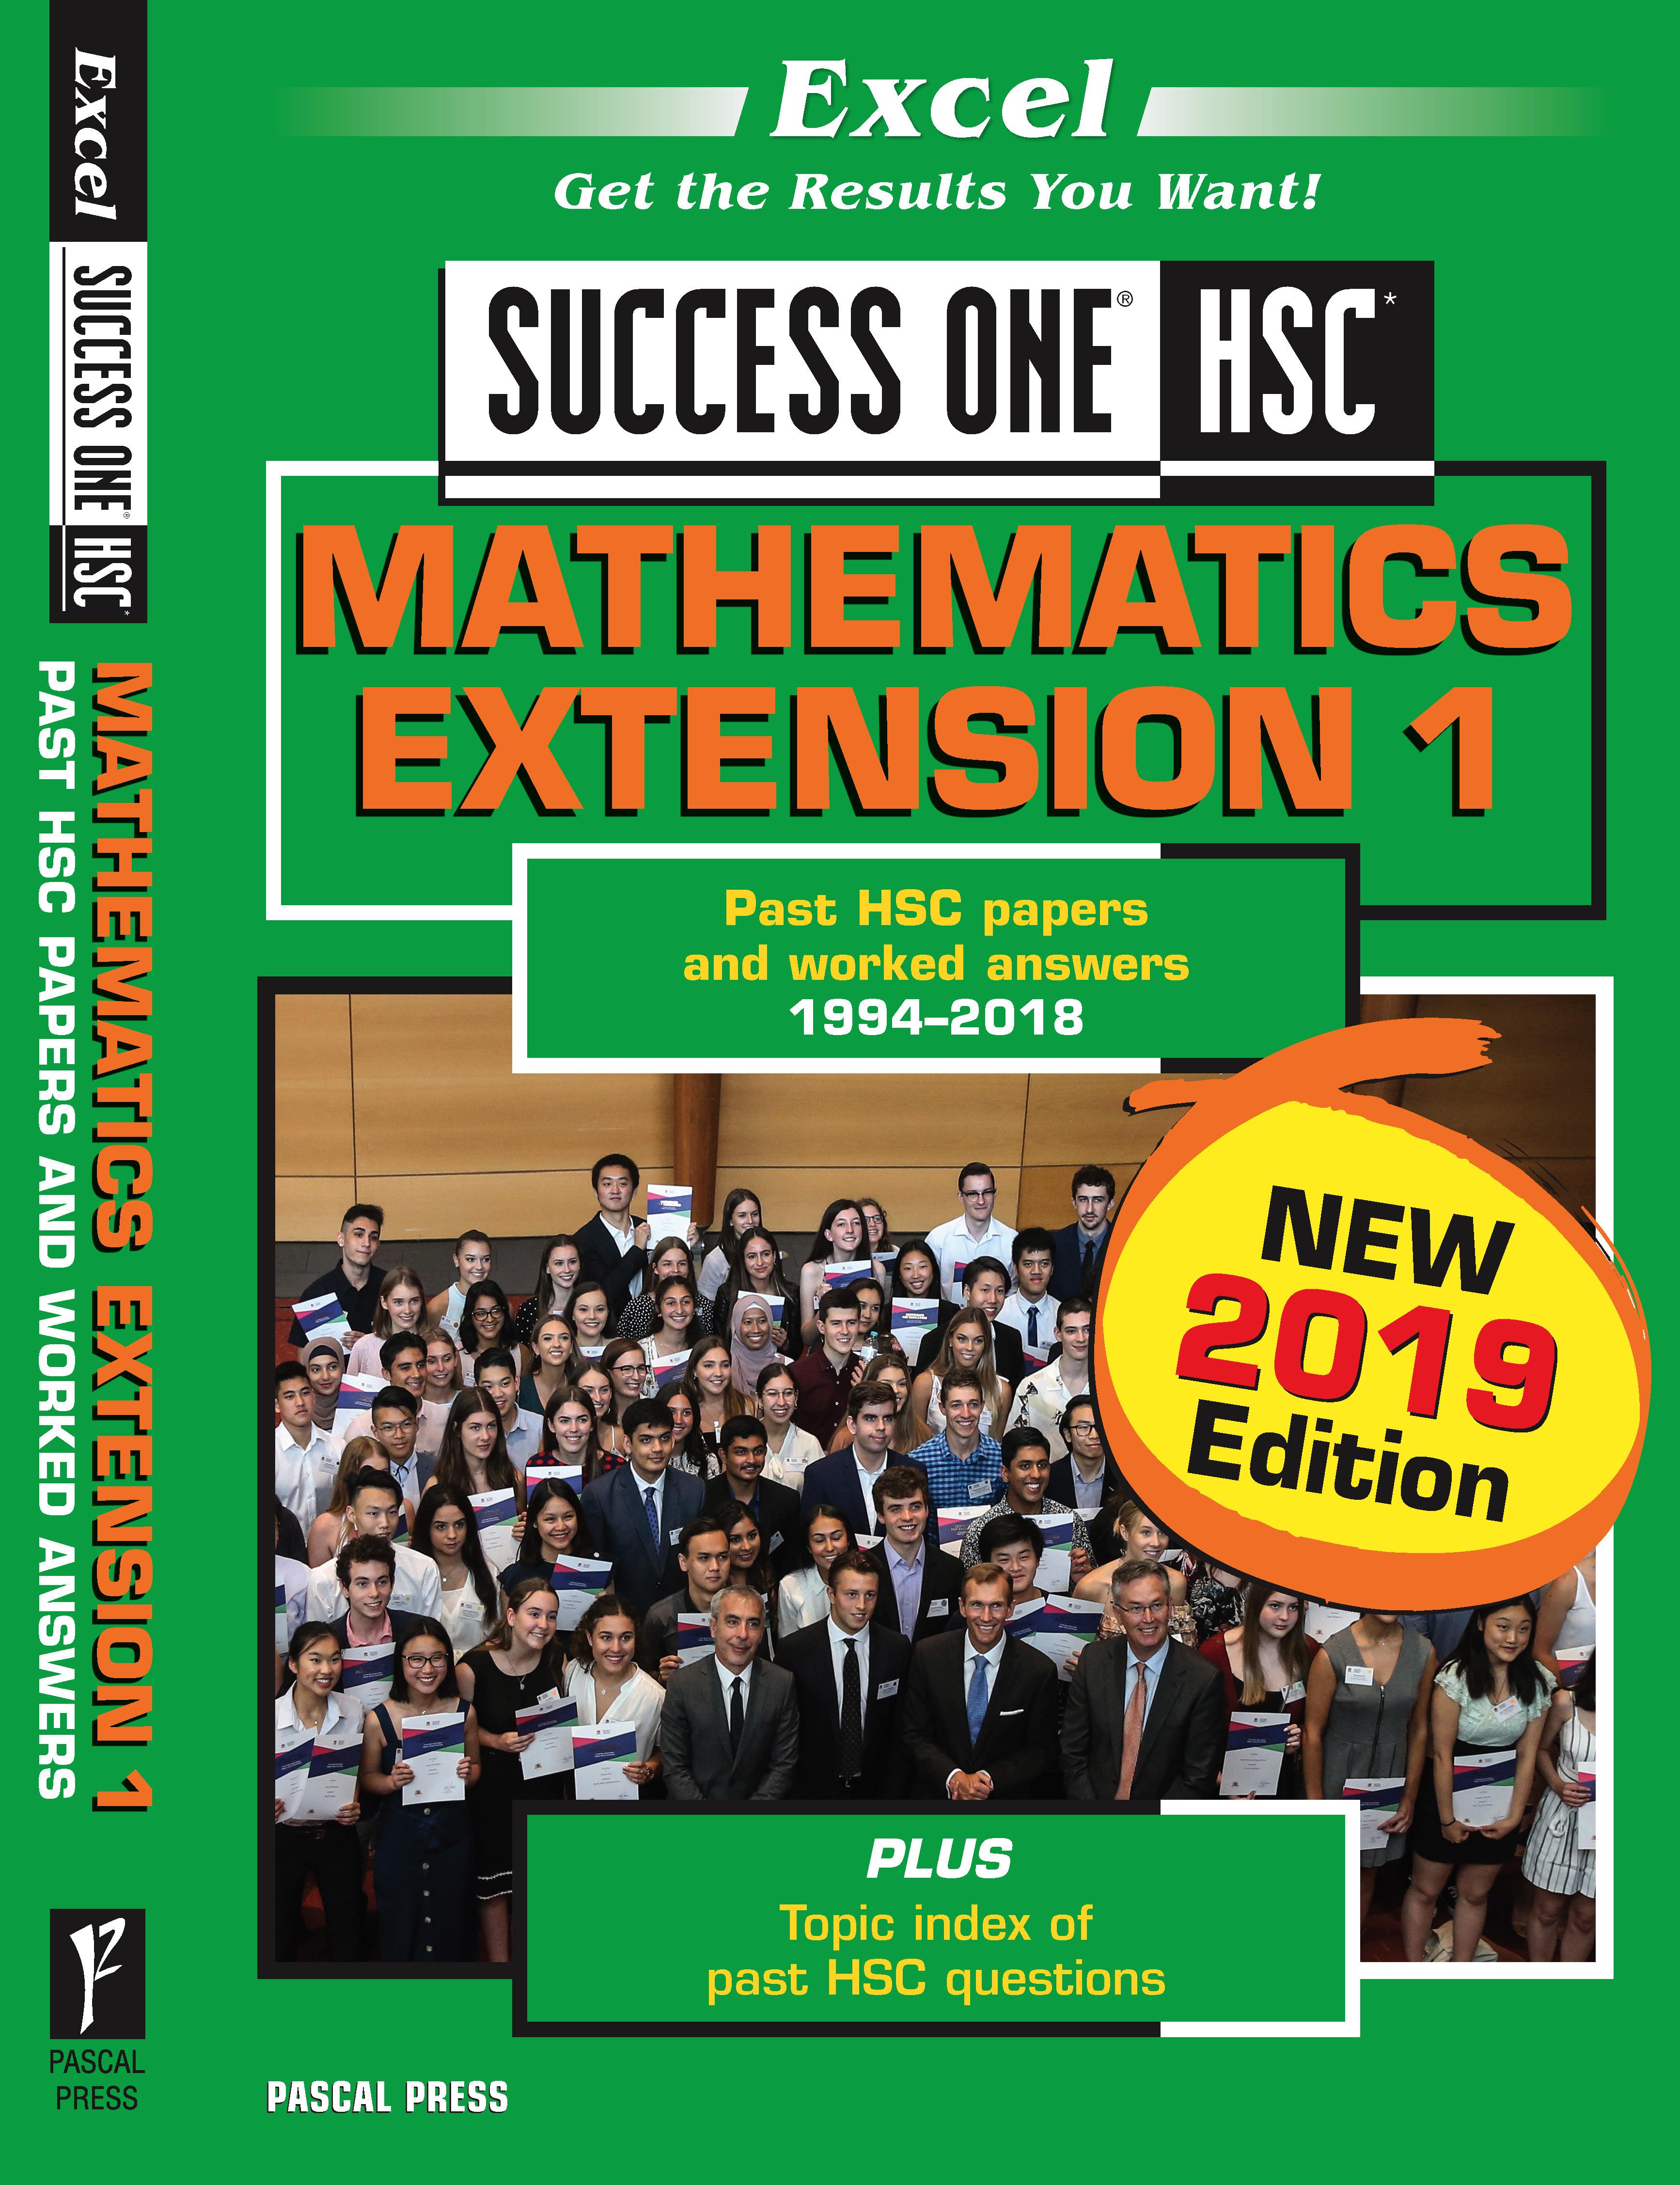 Excel Success One HSC Maths Extension 1